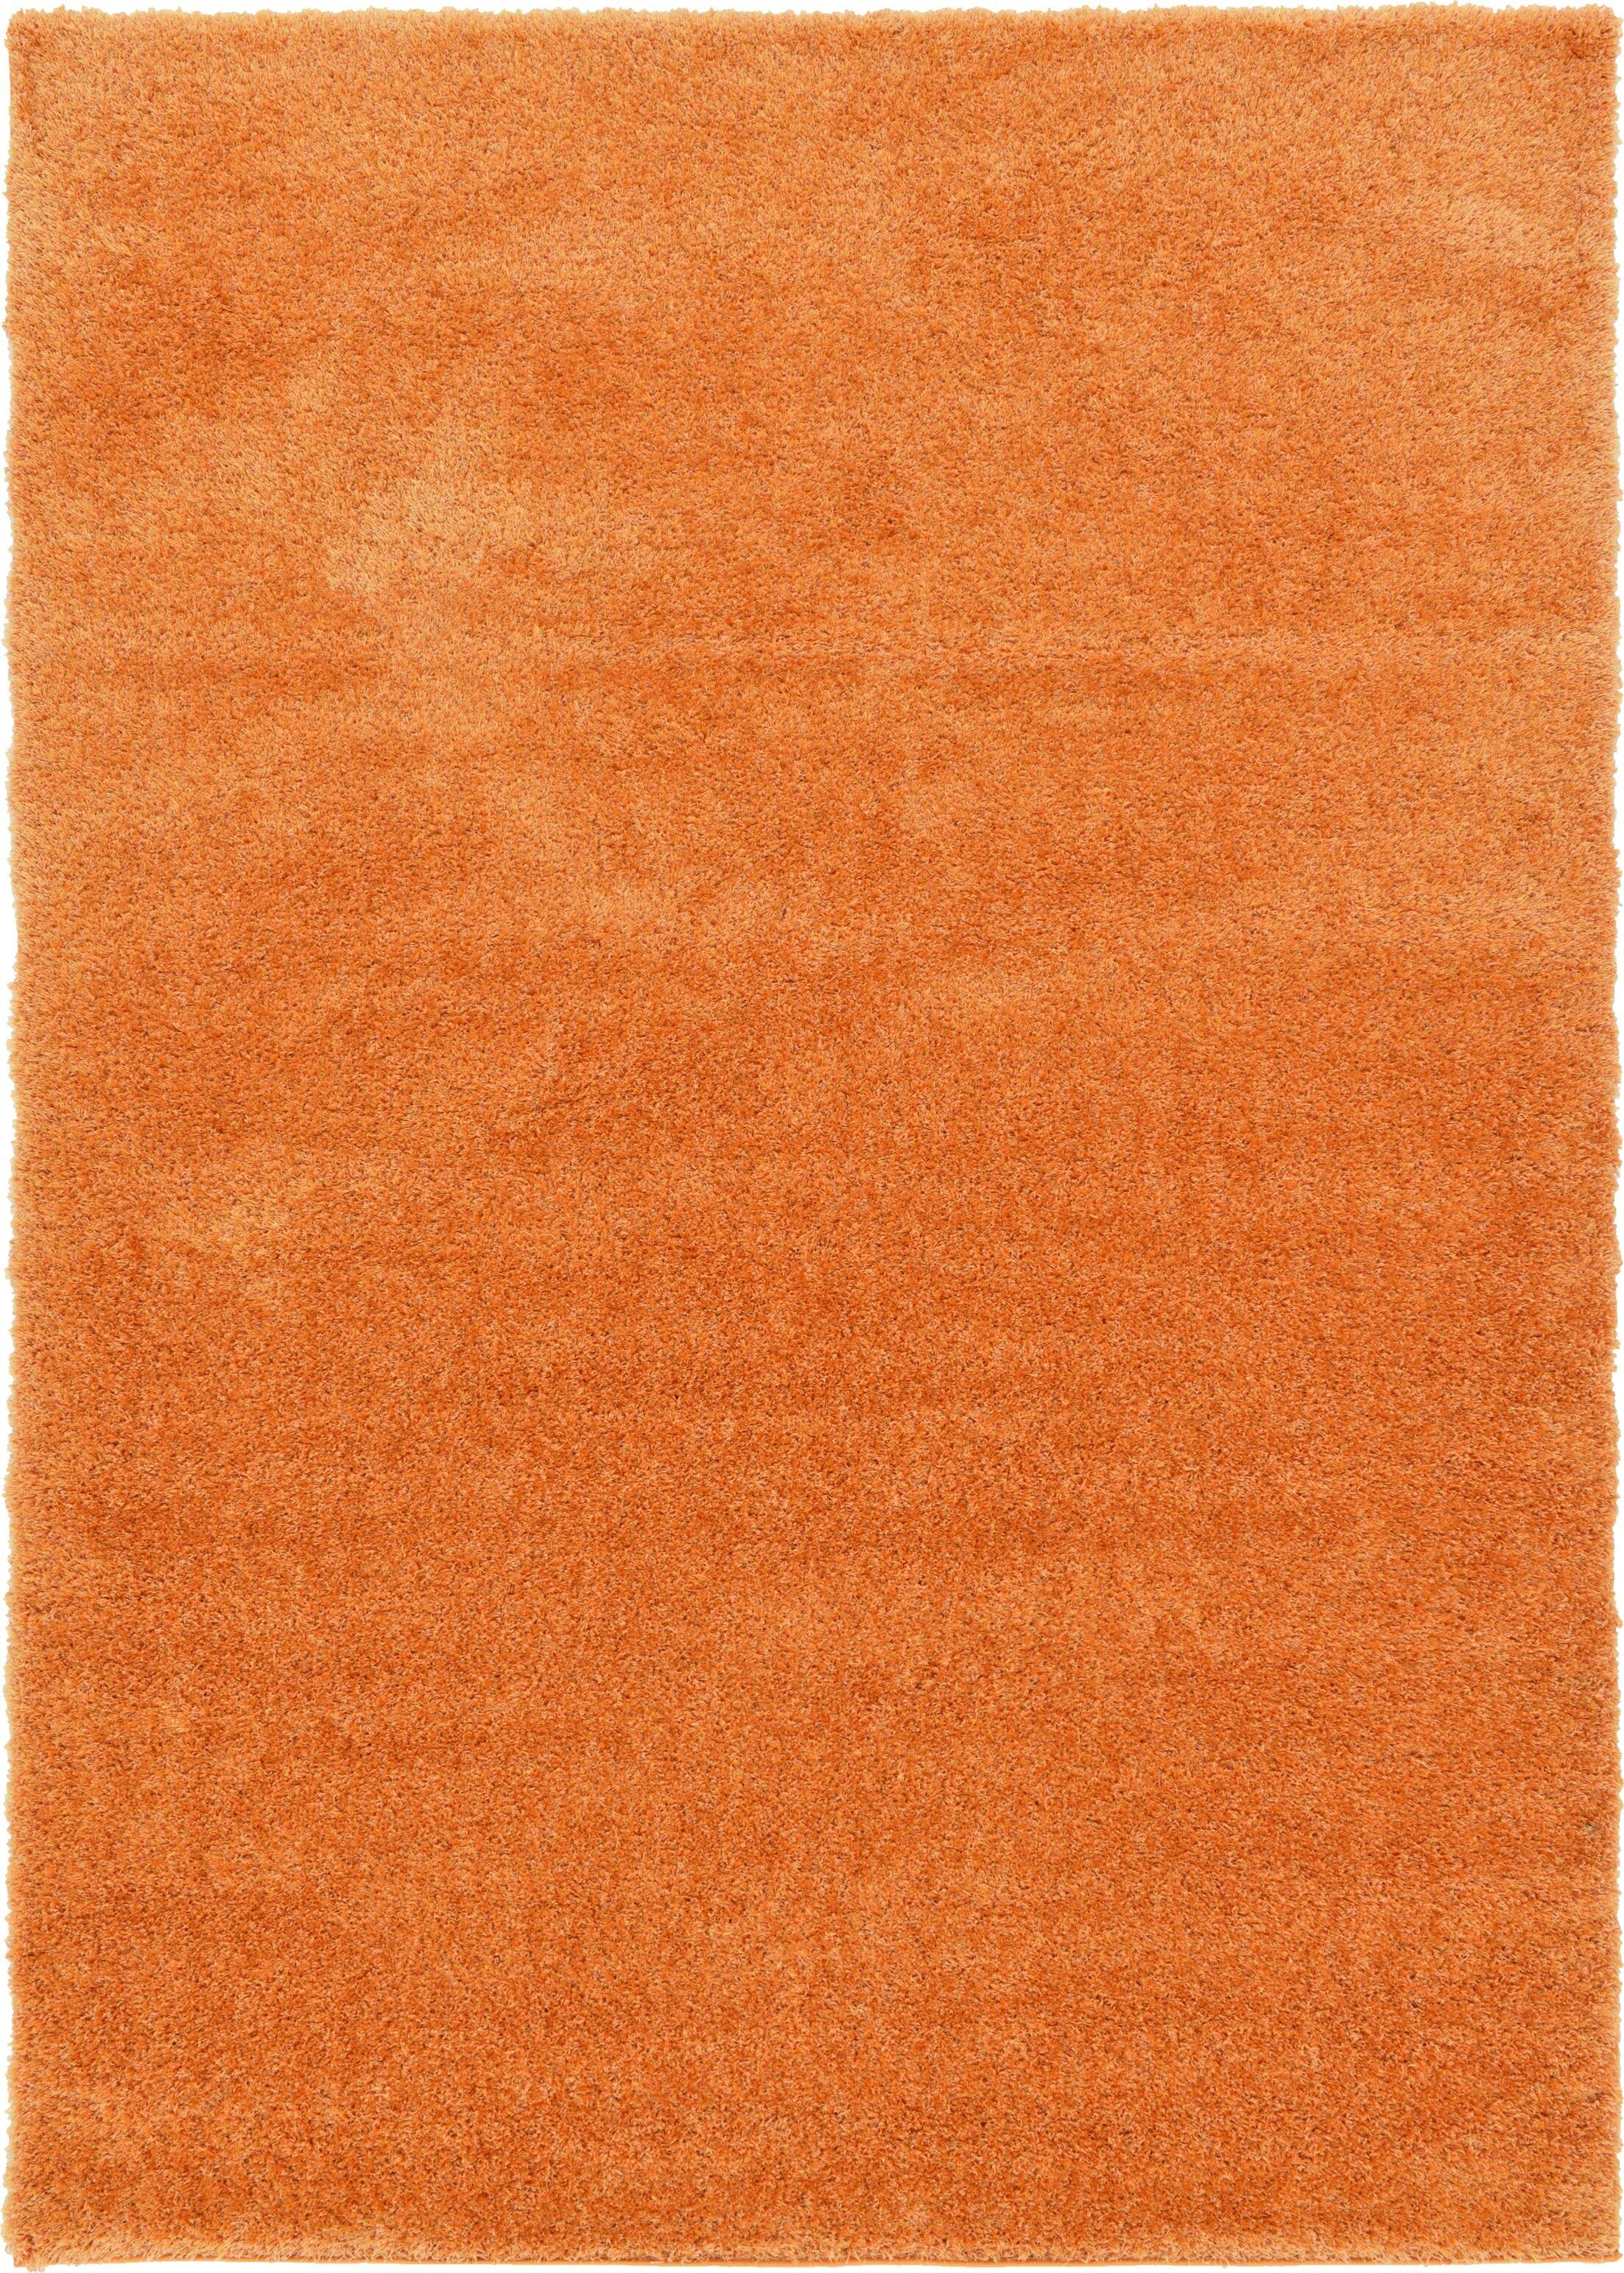 Evelyn Orange Area Rug Rug Size: Rectangle 7' x 10'